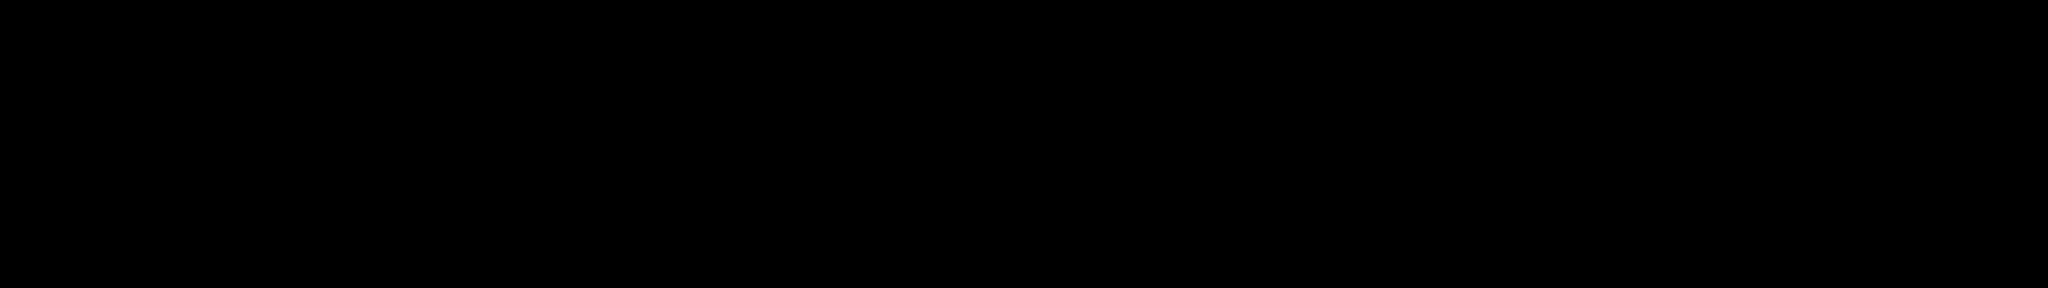 Ohio Innovation Fund Black Mark